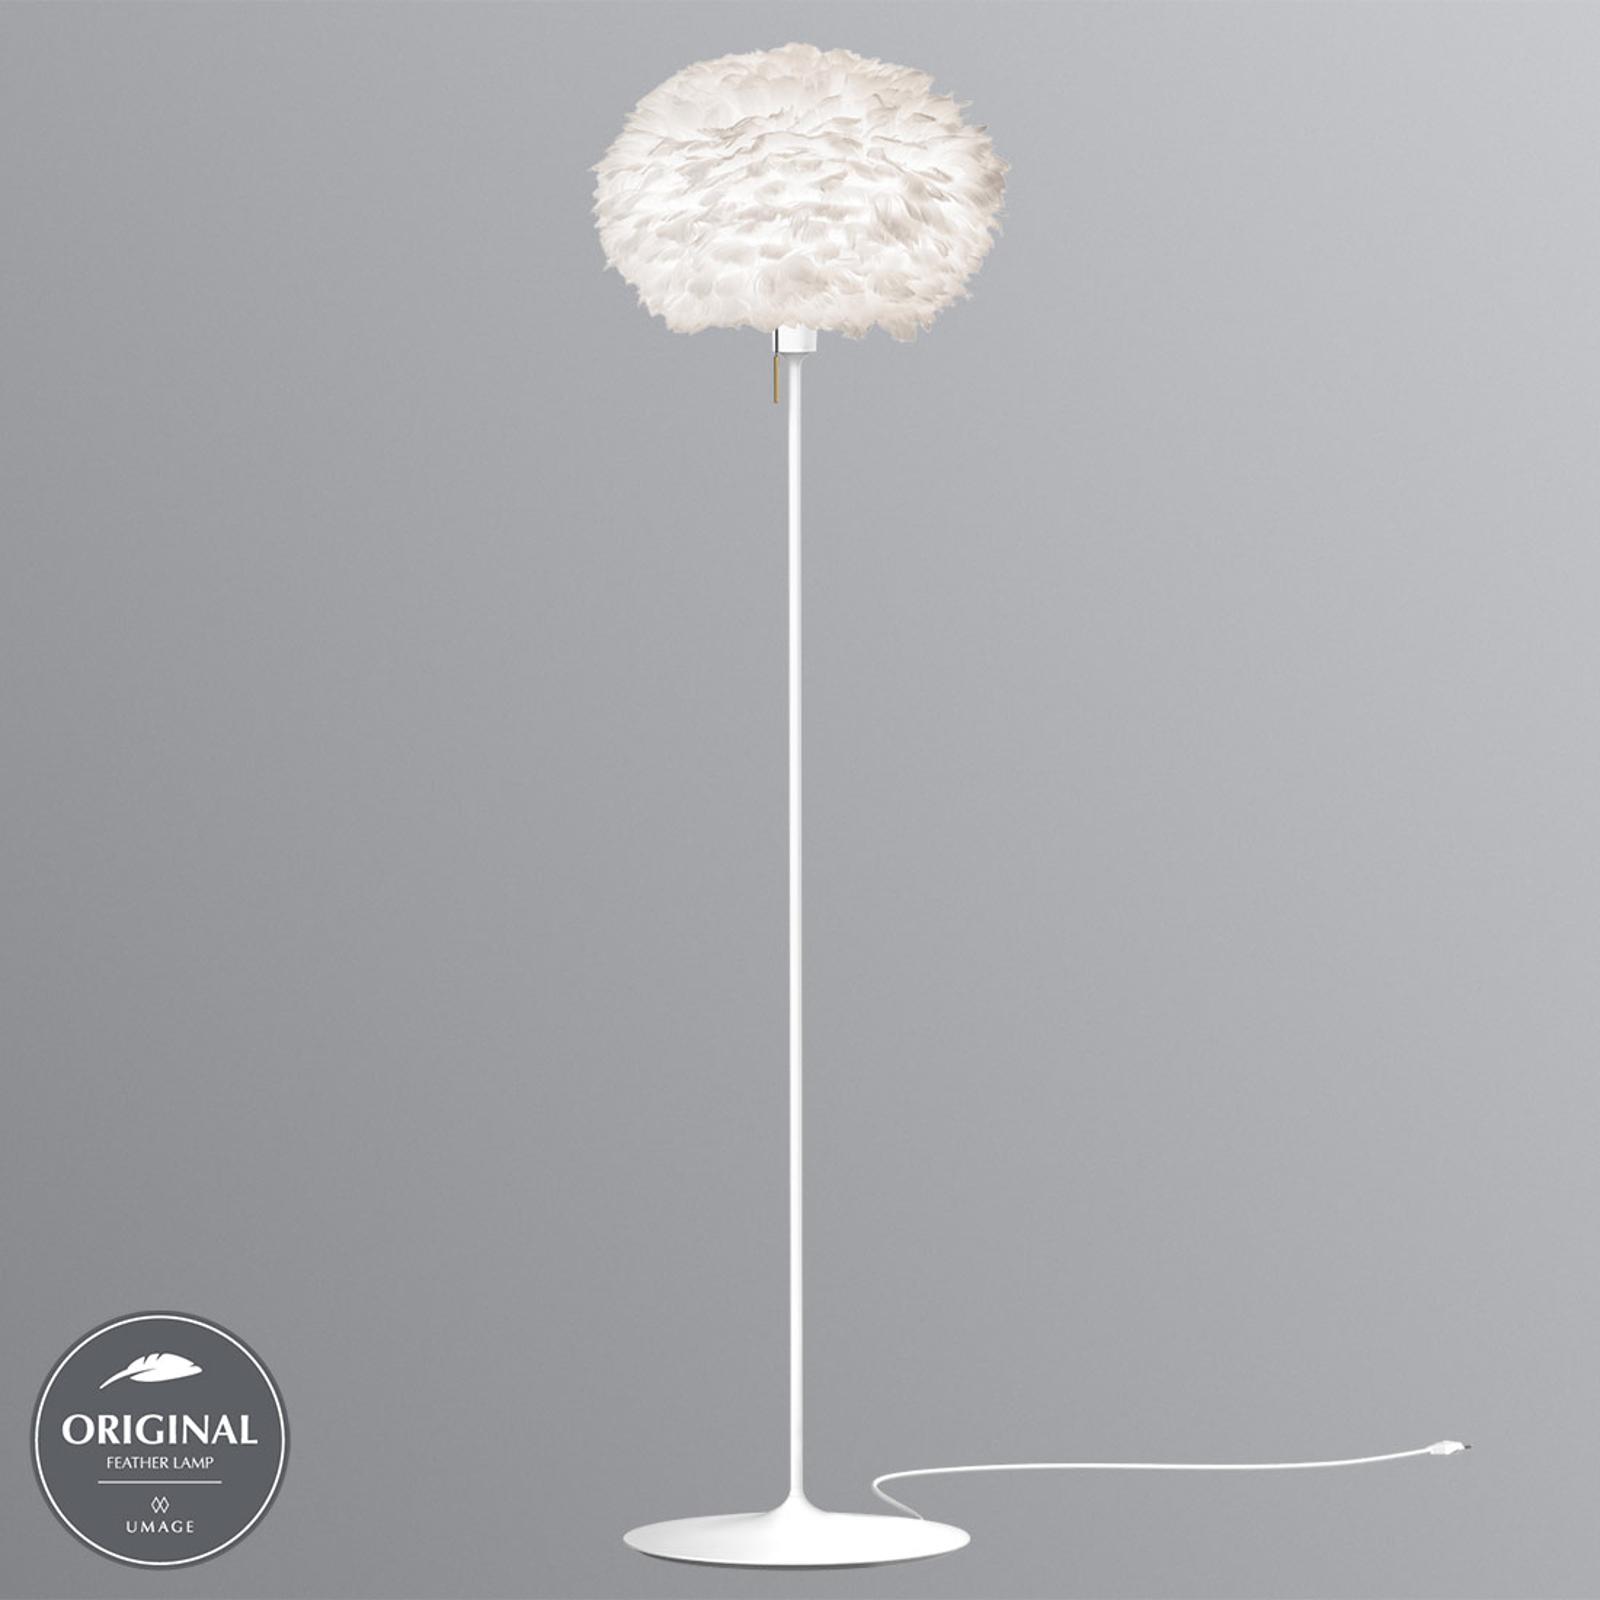 UMAGE Eos medium gulvlampe i hvit